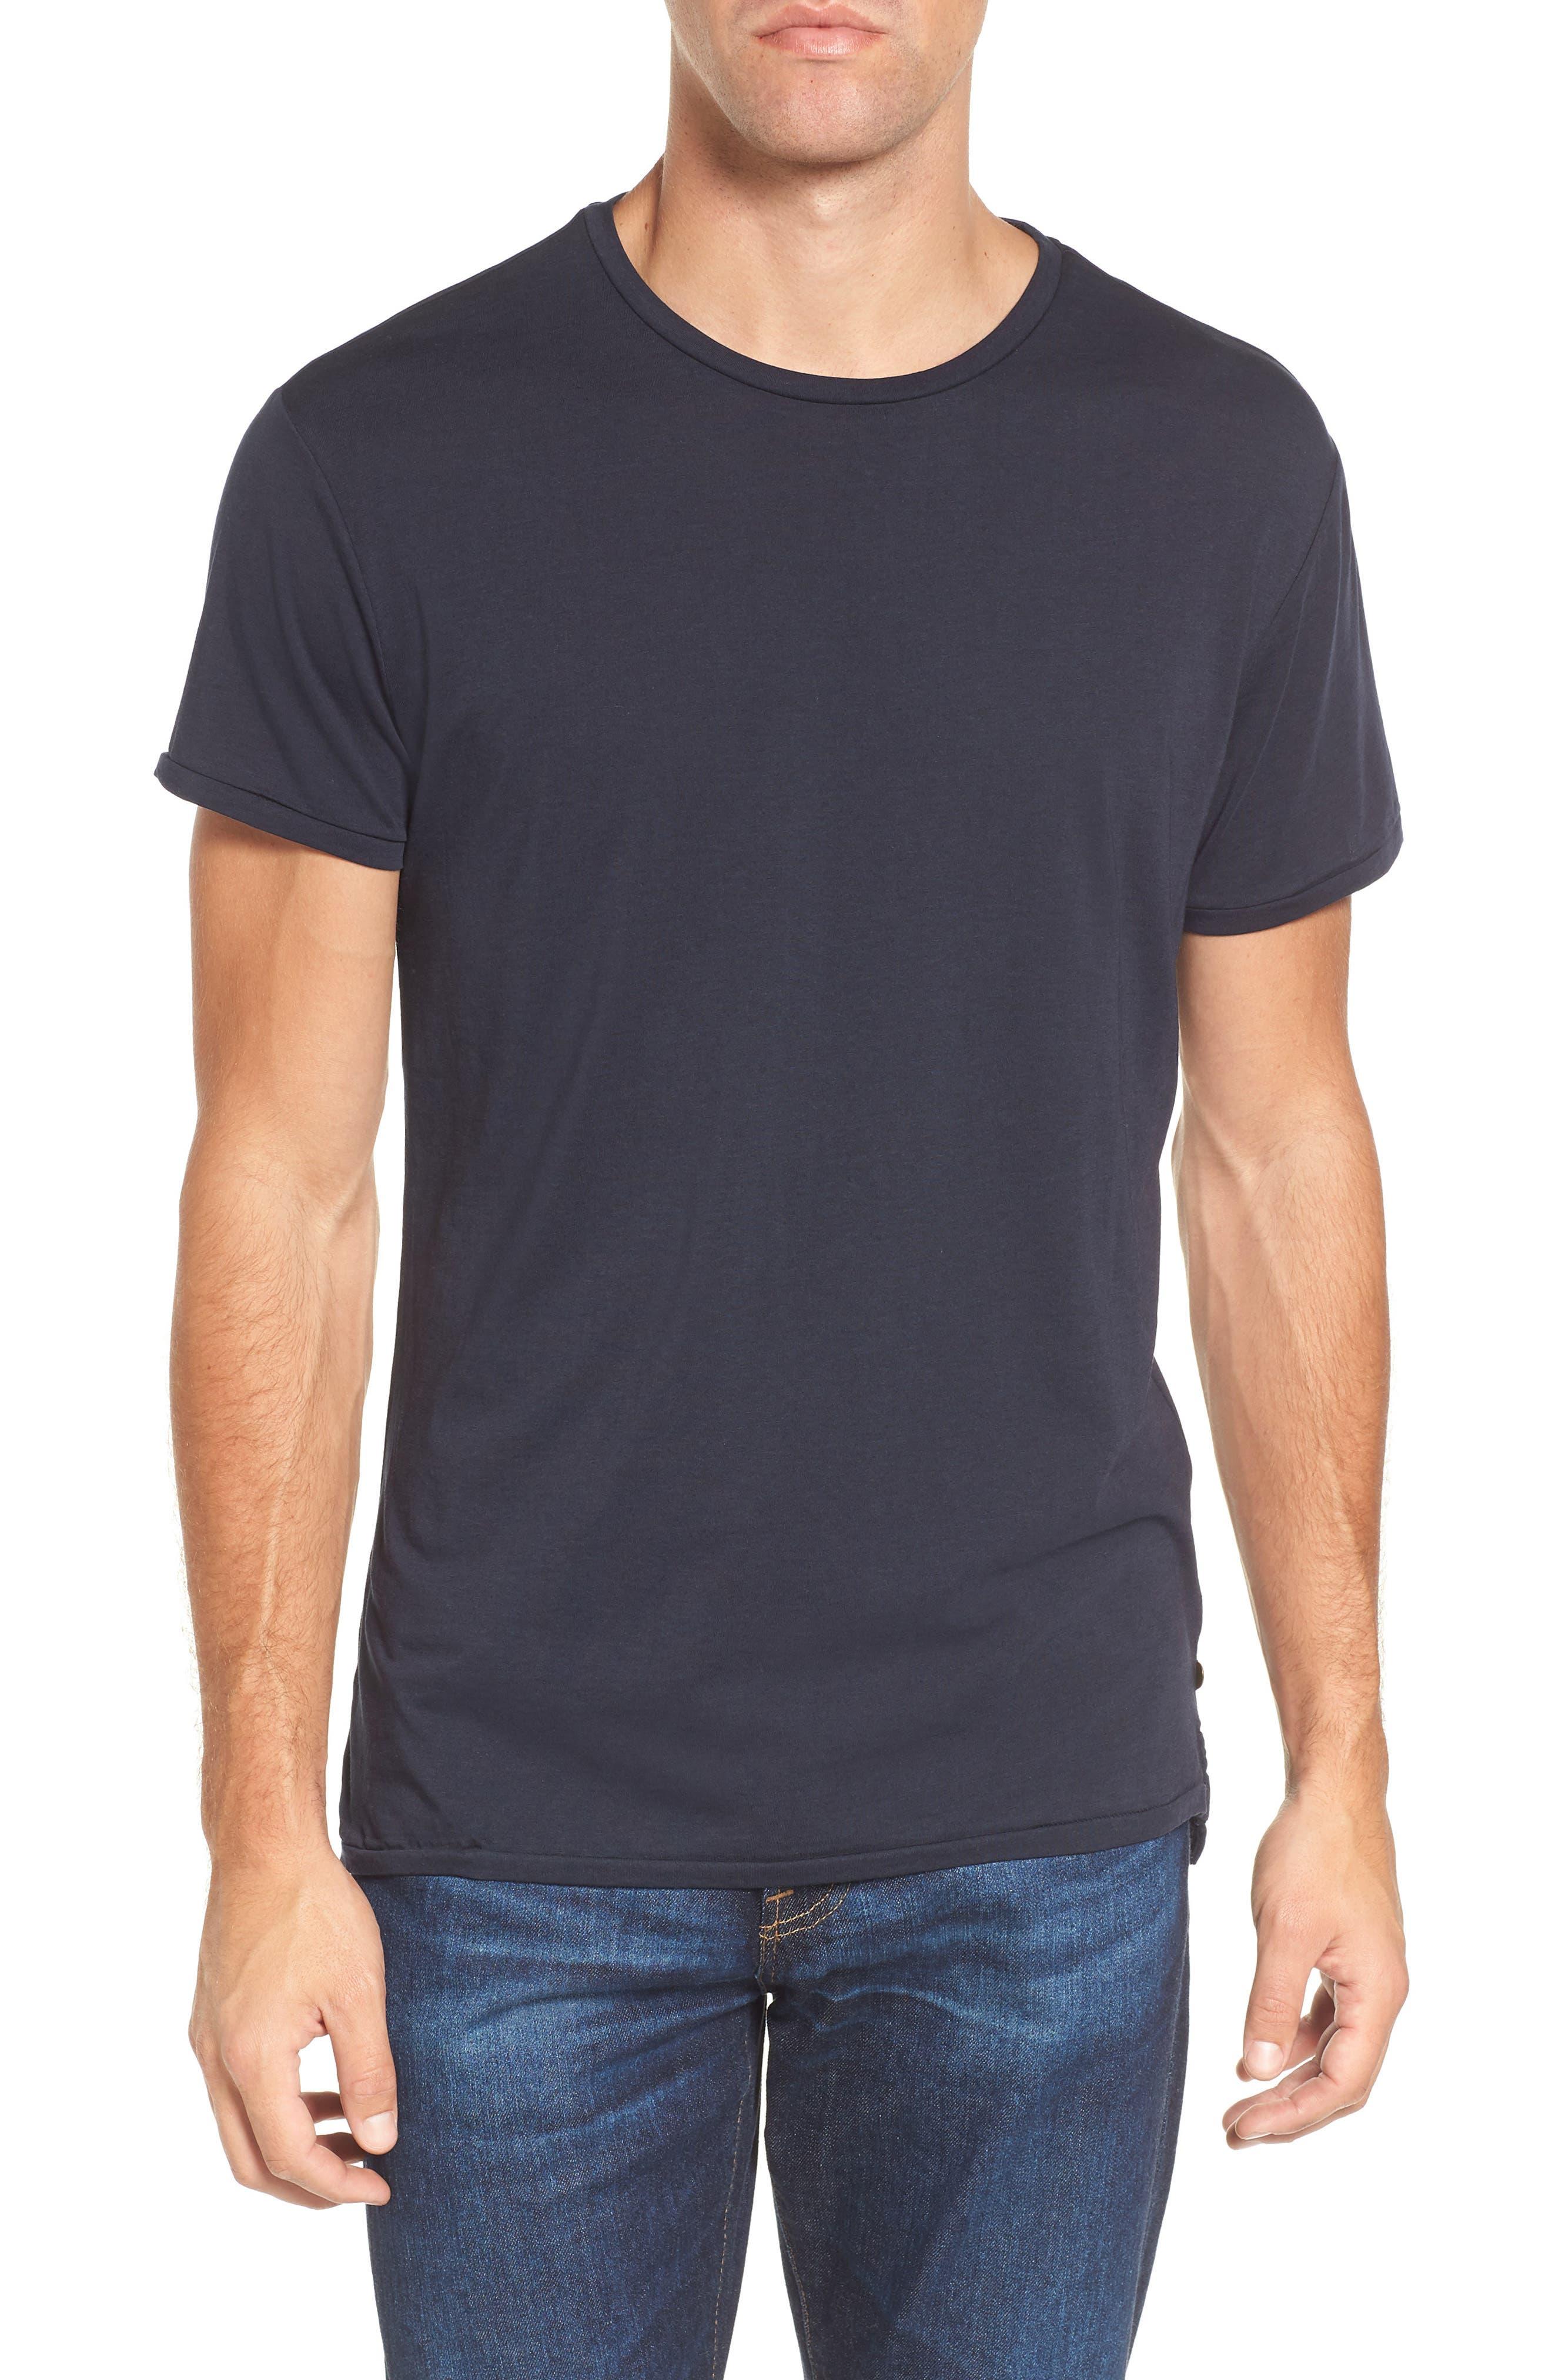 Scotch & Soda Chic Crewneck T-Shirt